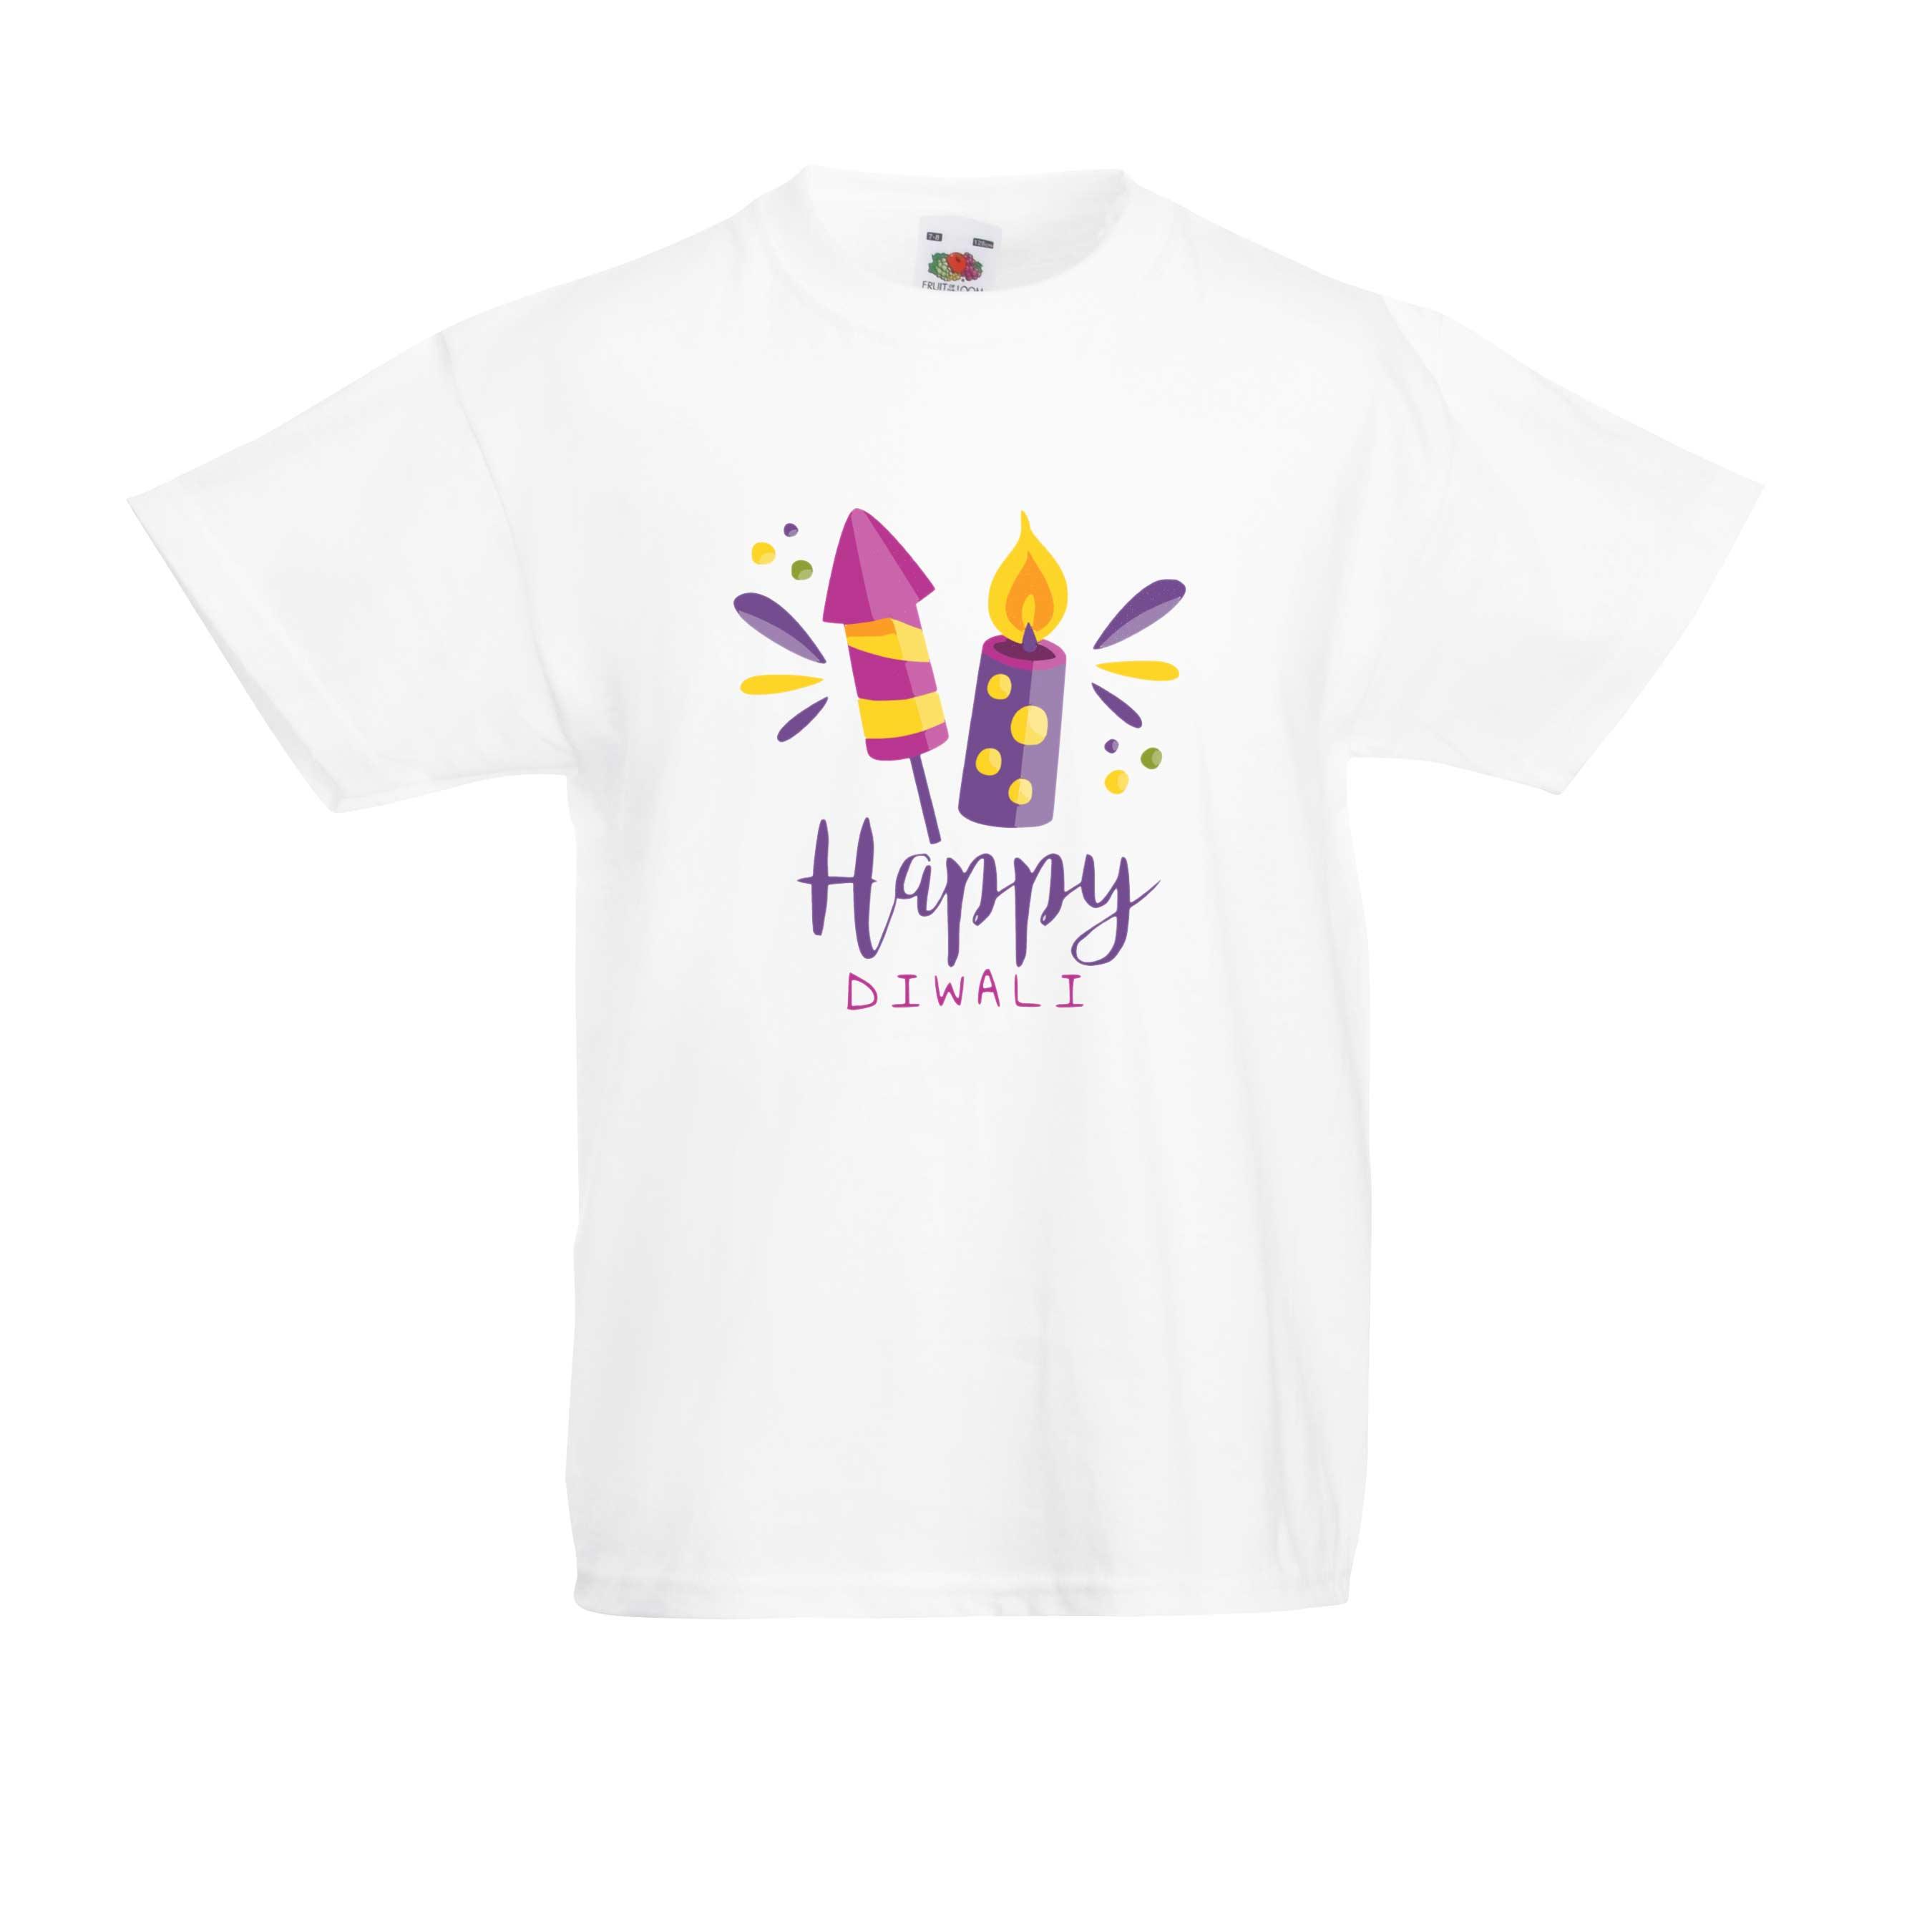 Diwali design for t-shirt, hoodie & sweatshirt